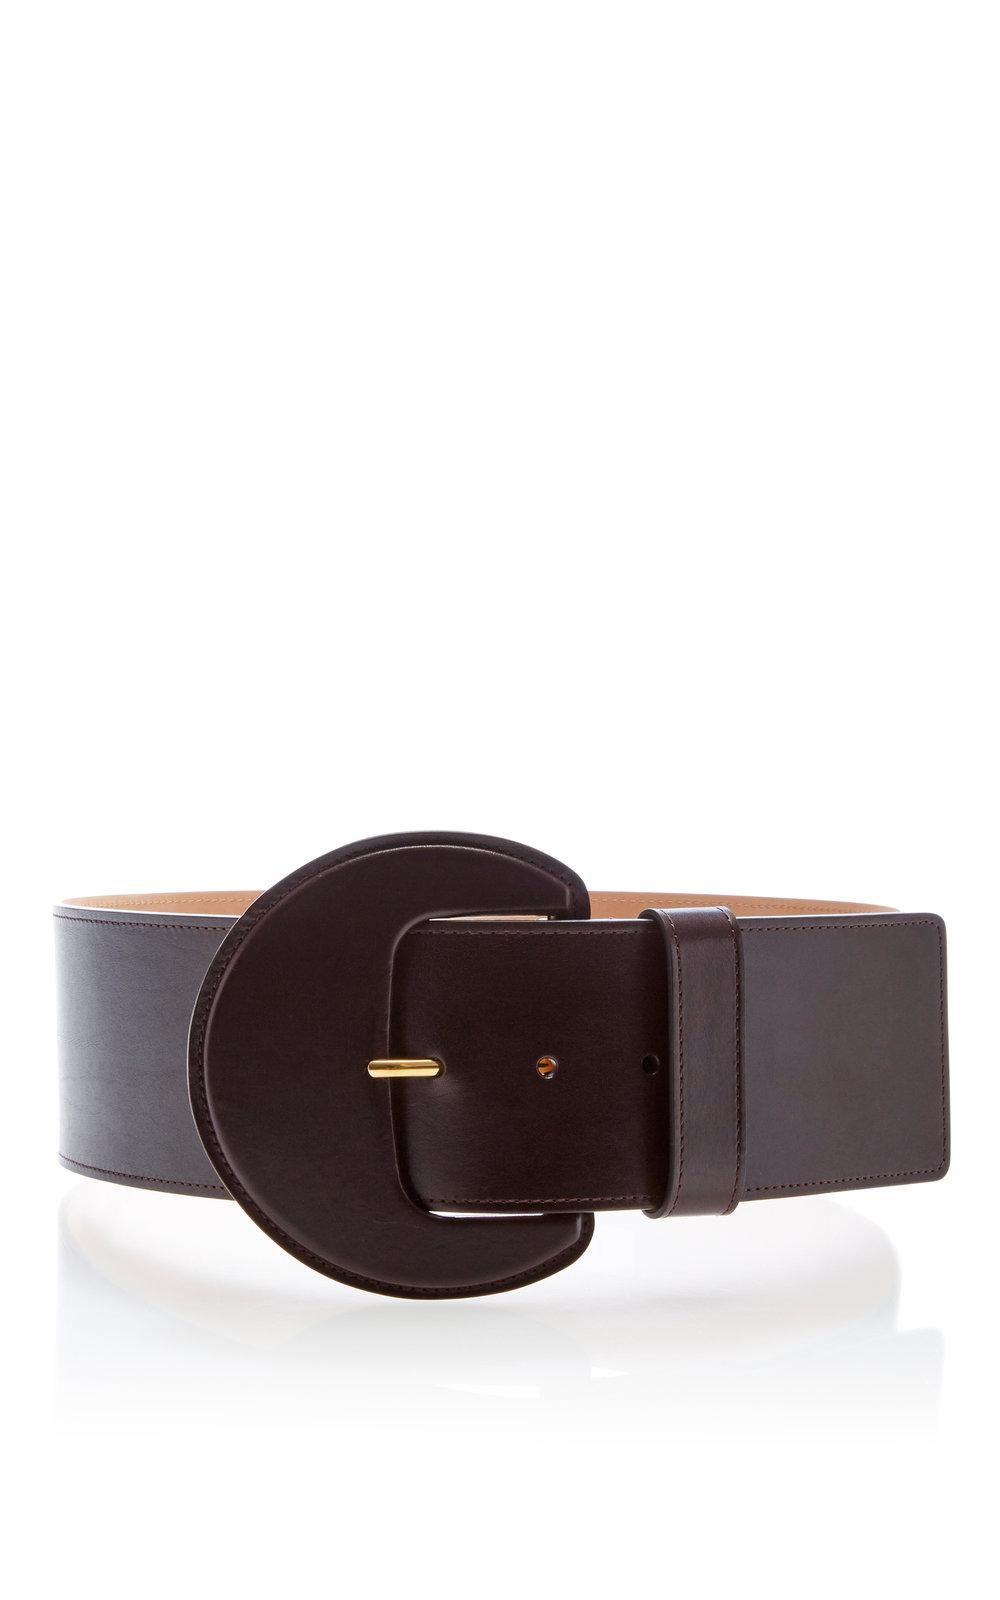 large_michael-kors-brown-extra-large-leather-belt-3.jpg